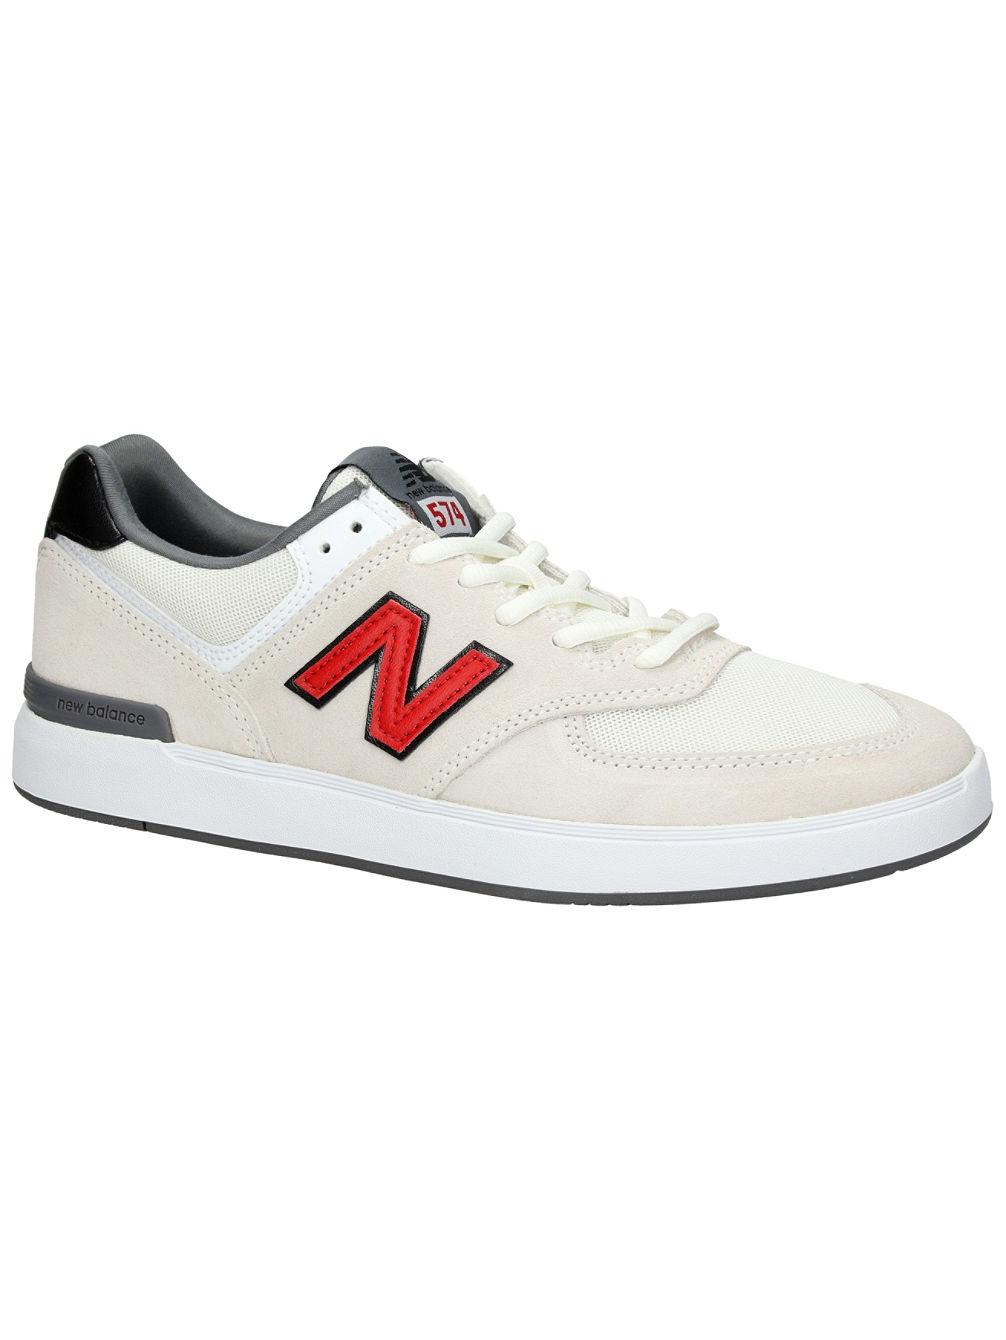 pantalones entrada Matemático  Buy New Balance All Coasts AM574 Skate Shoes online at Blue Tomato